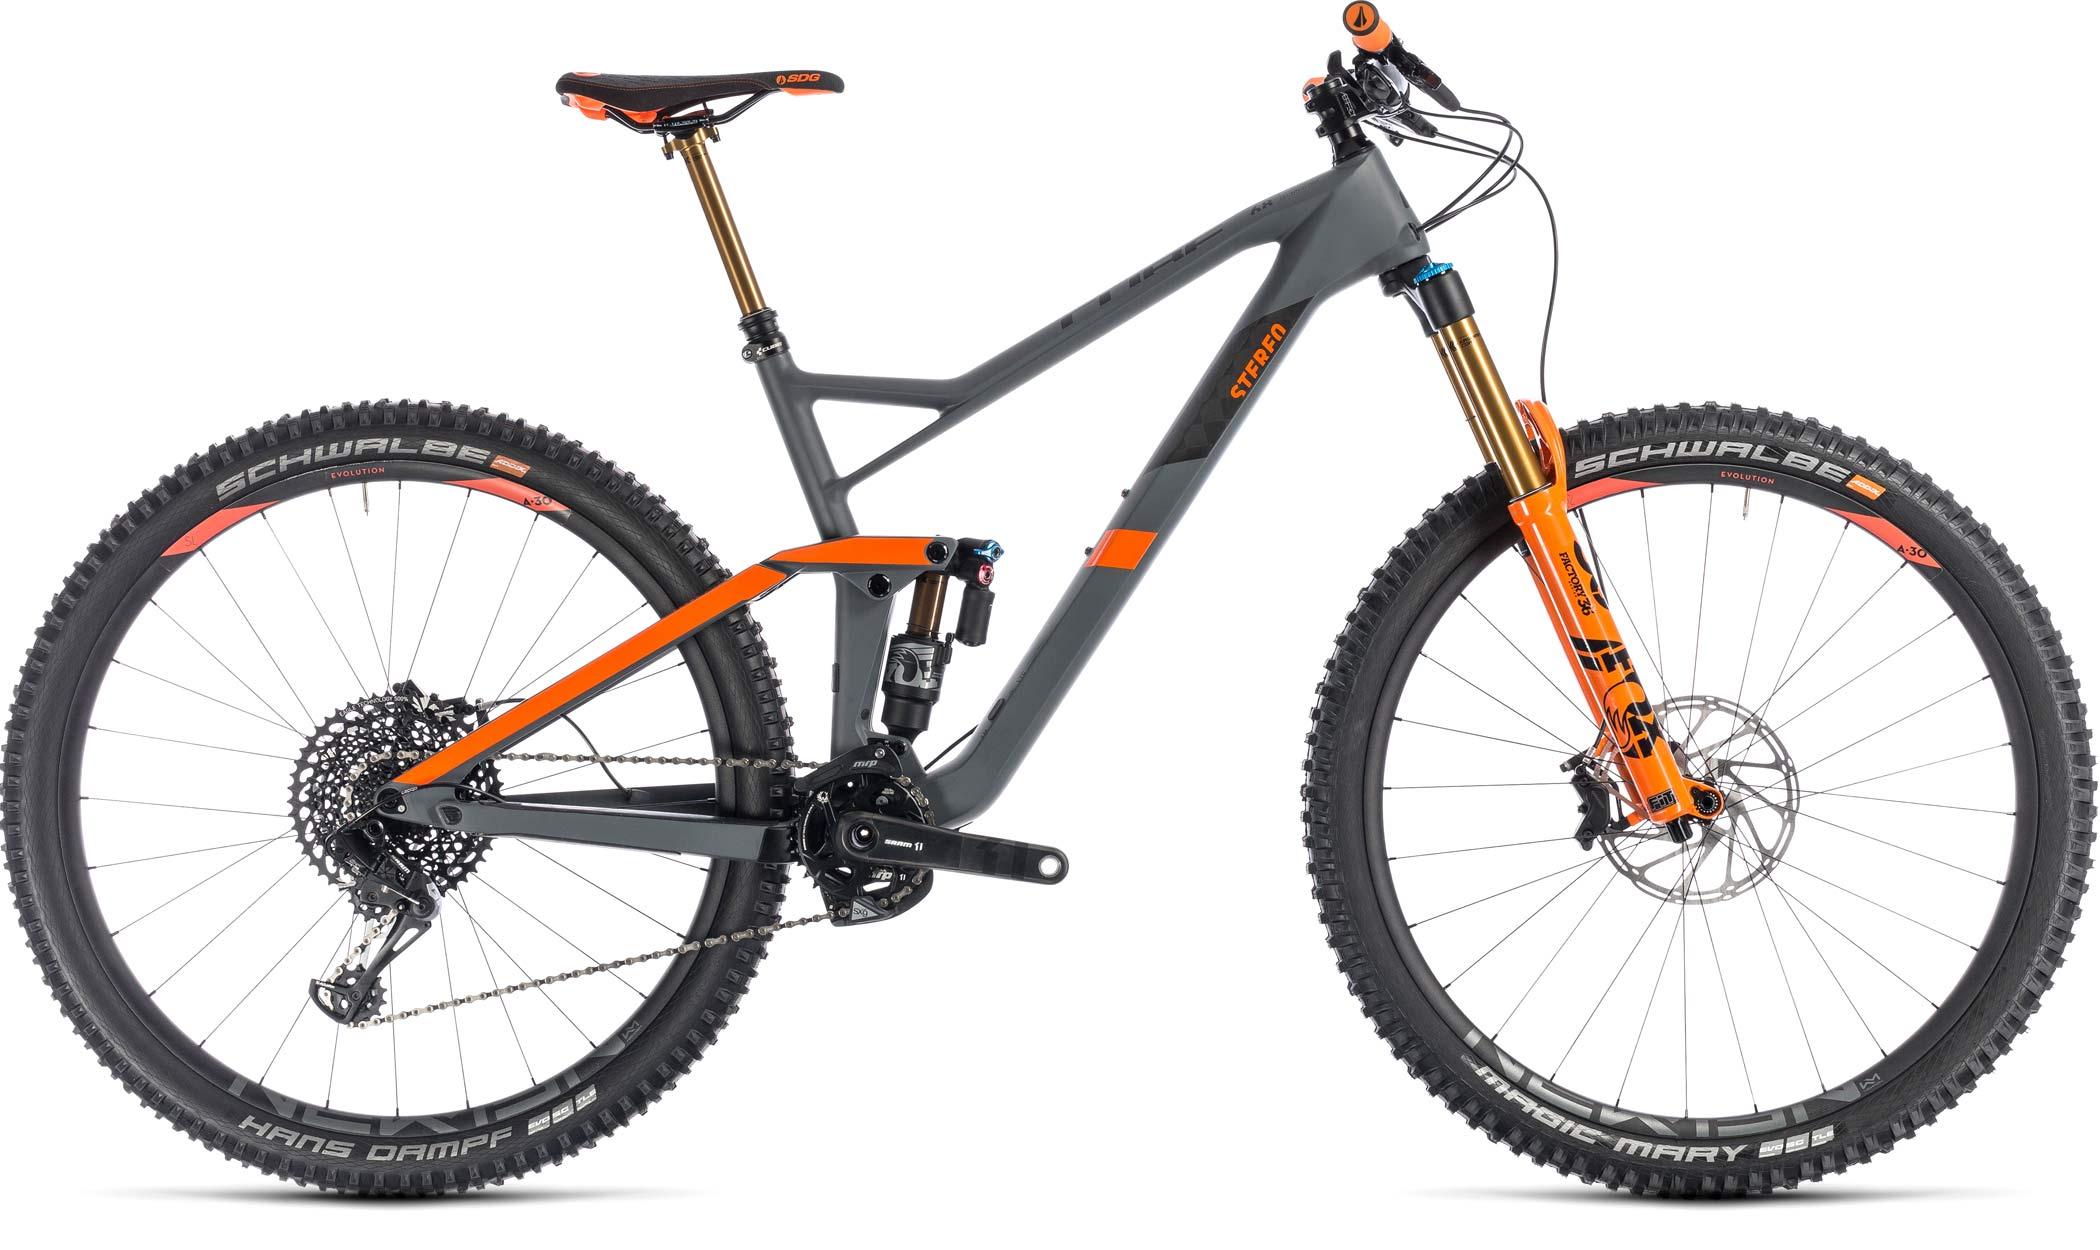 Cube Stereo 150 29 Race Ready Carbon Enduro Mountain Bike